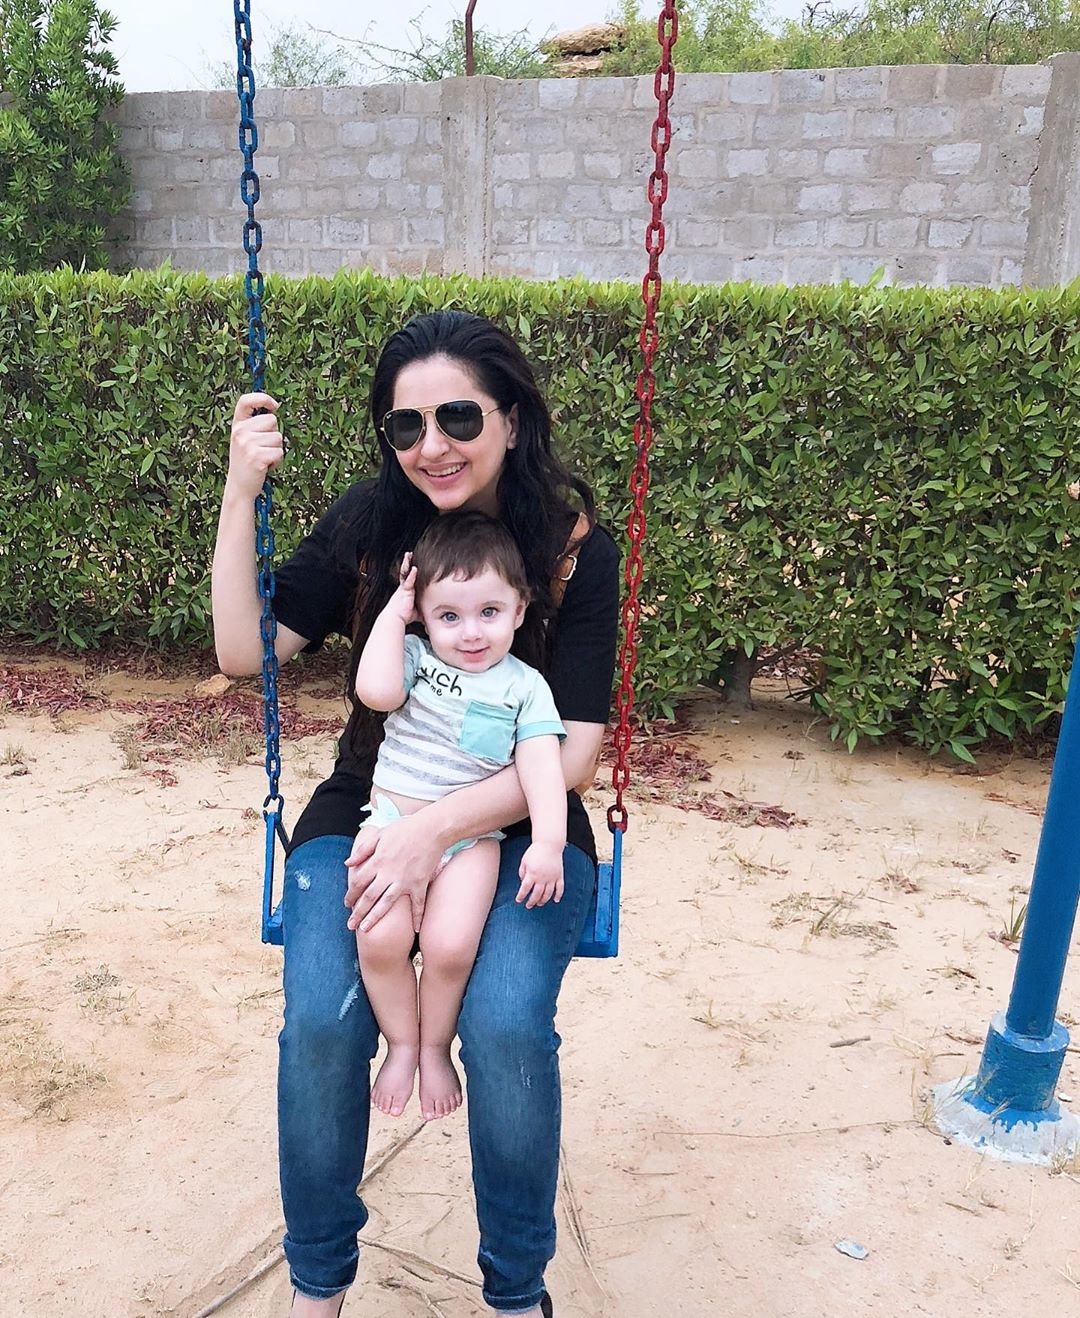 Beautiful Couple Fatima Effendi and Kanwar Arsalan Enjoying with Kids at a Farm House